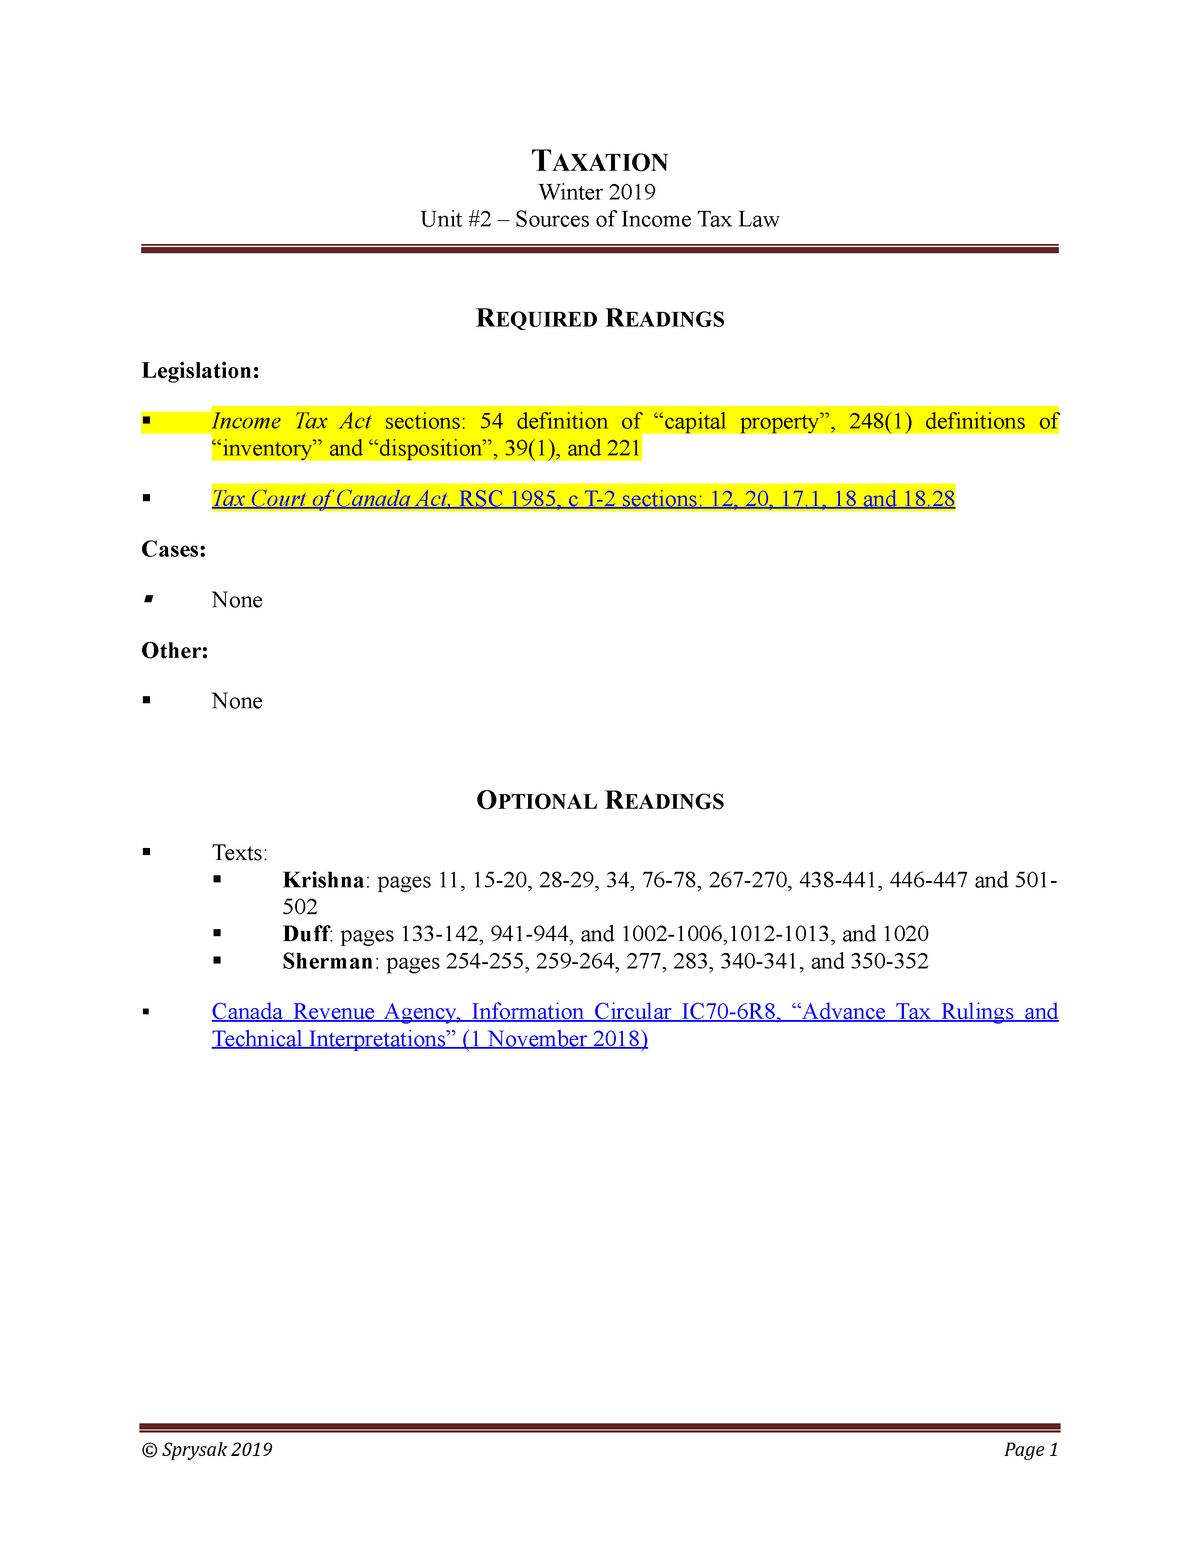 Unit 2 Reading List Professor Sprysak Law504 Taxation Studocu